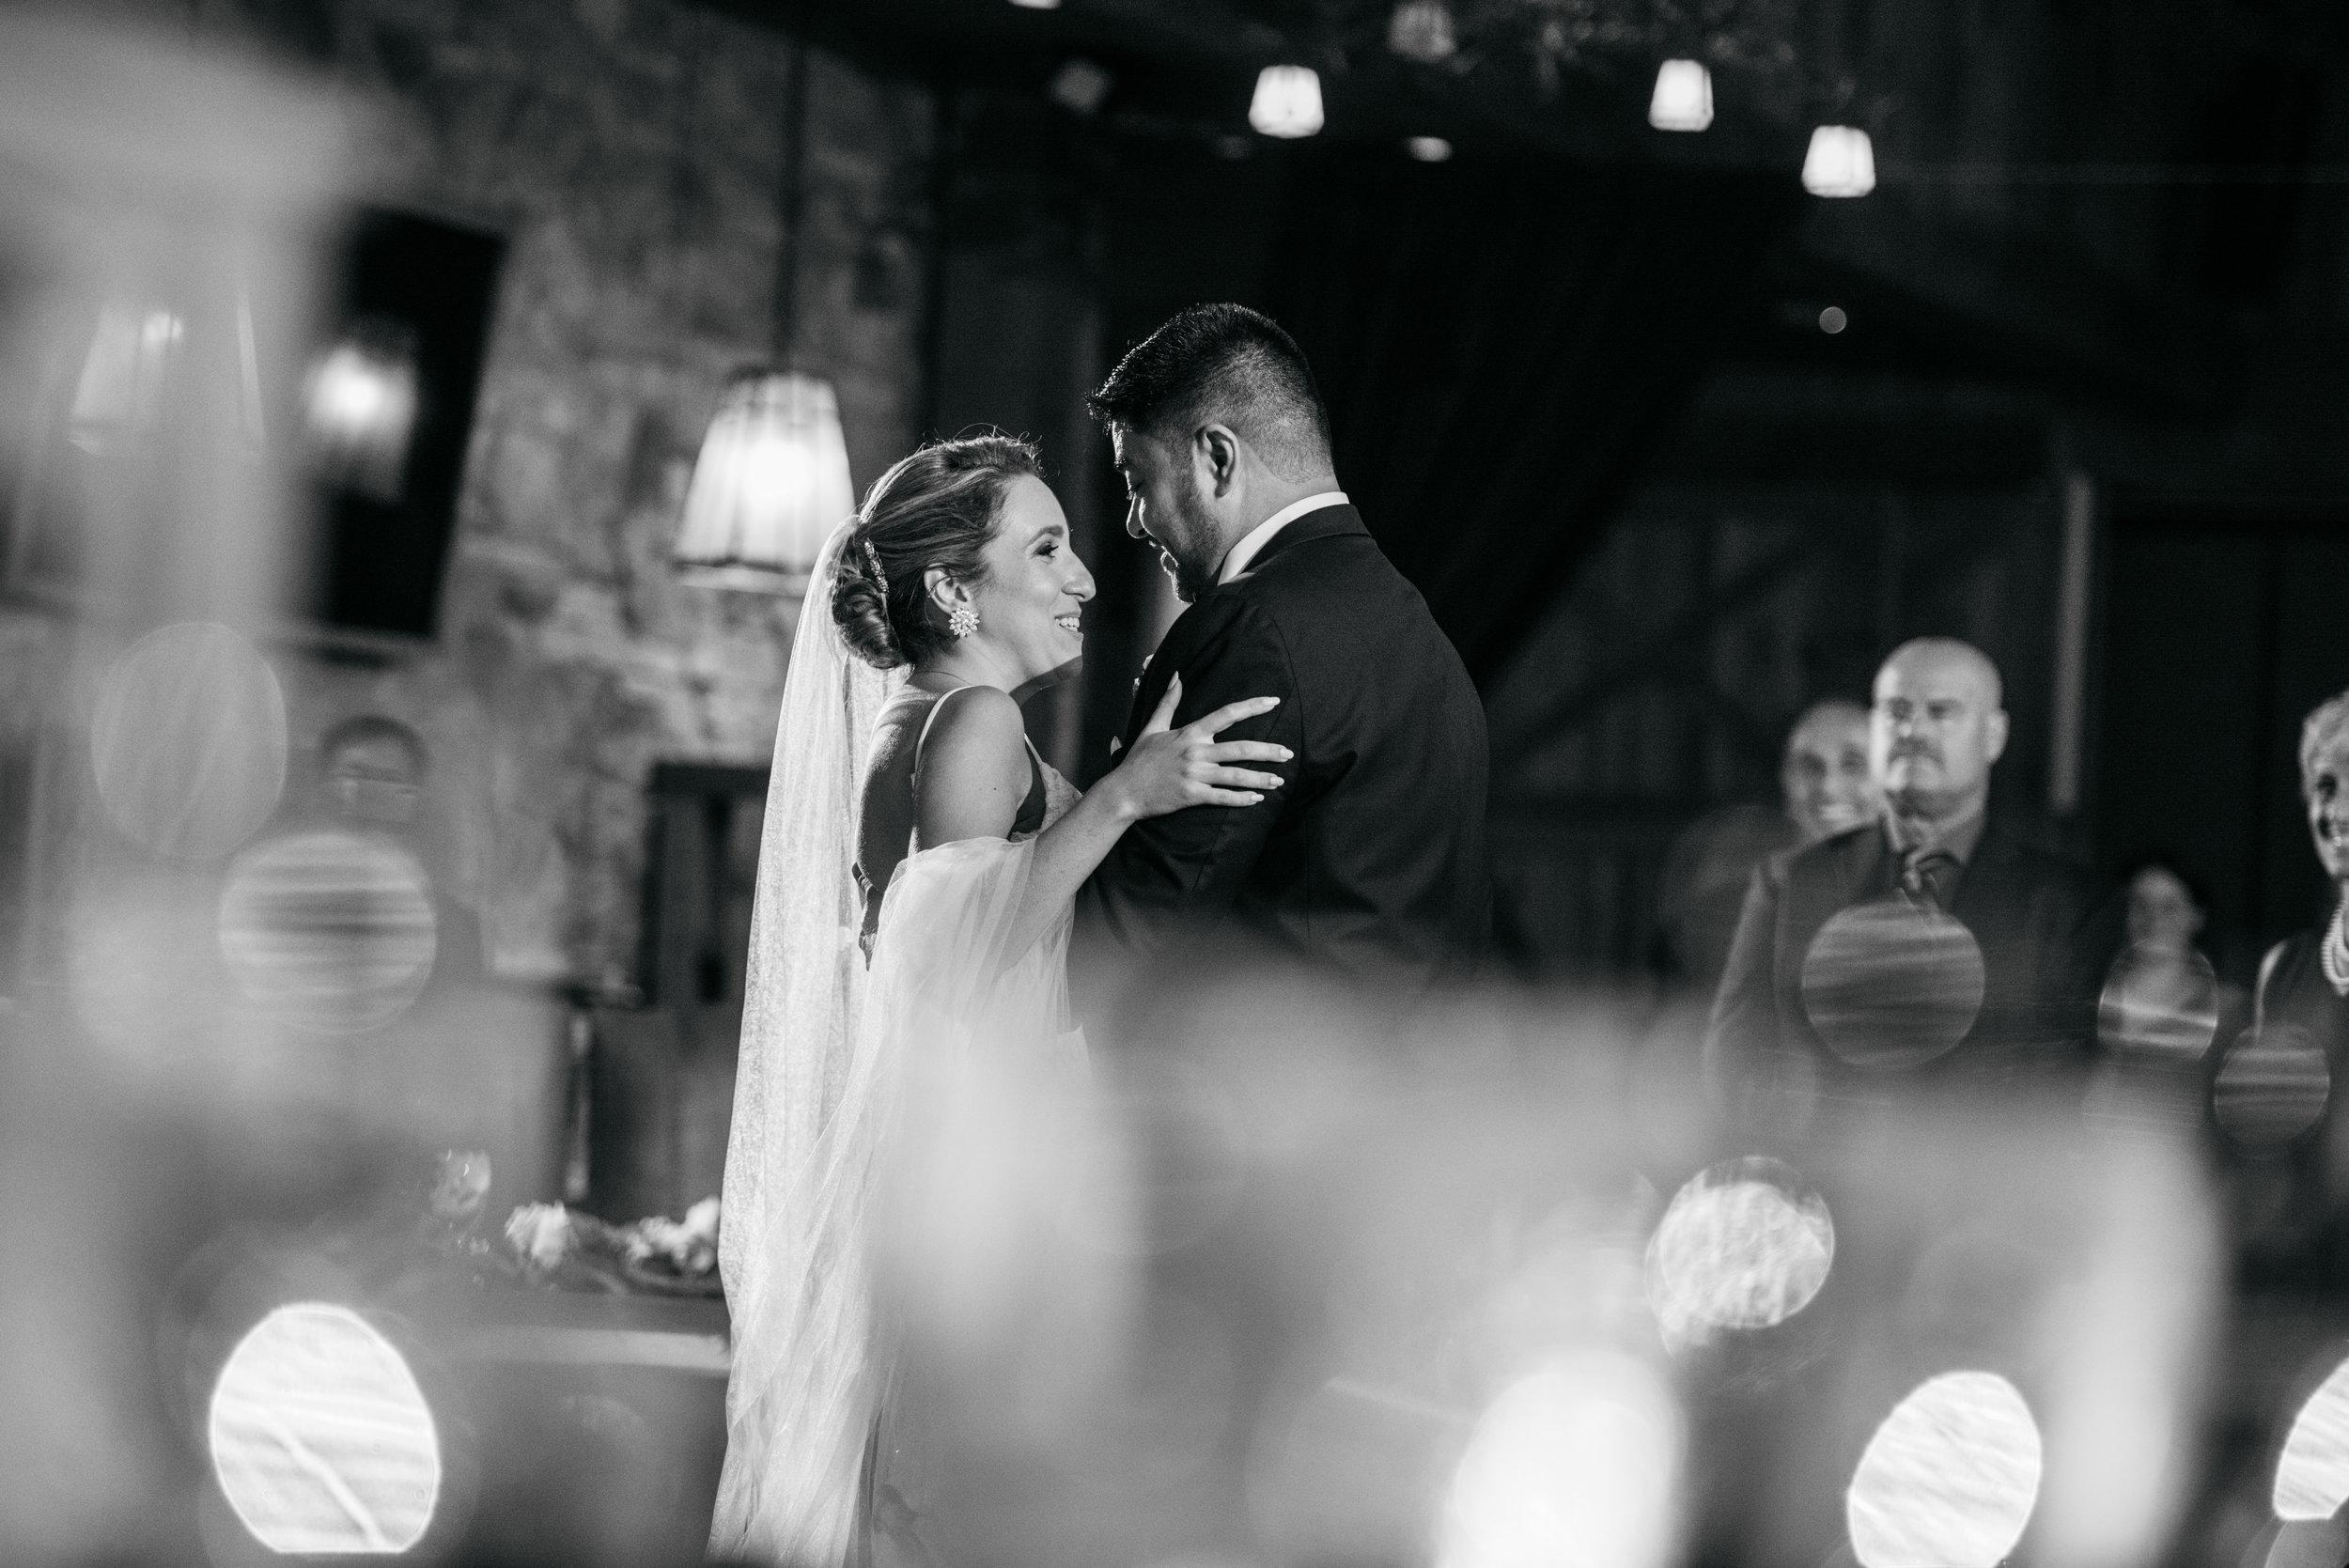 WeddingPhotos | NJPhotographer | Highlights-11-11.jpg